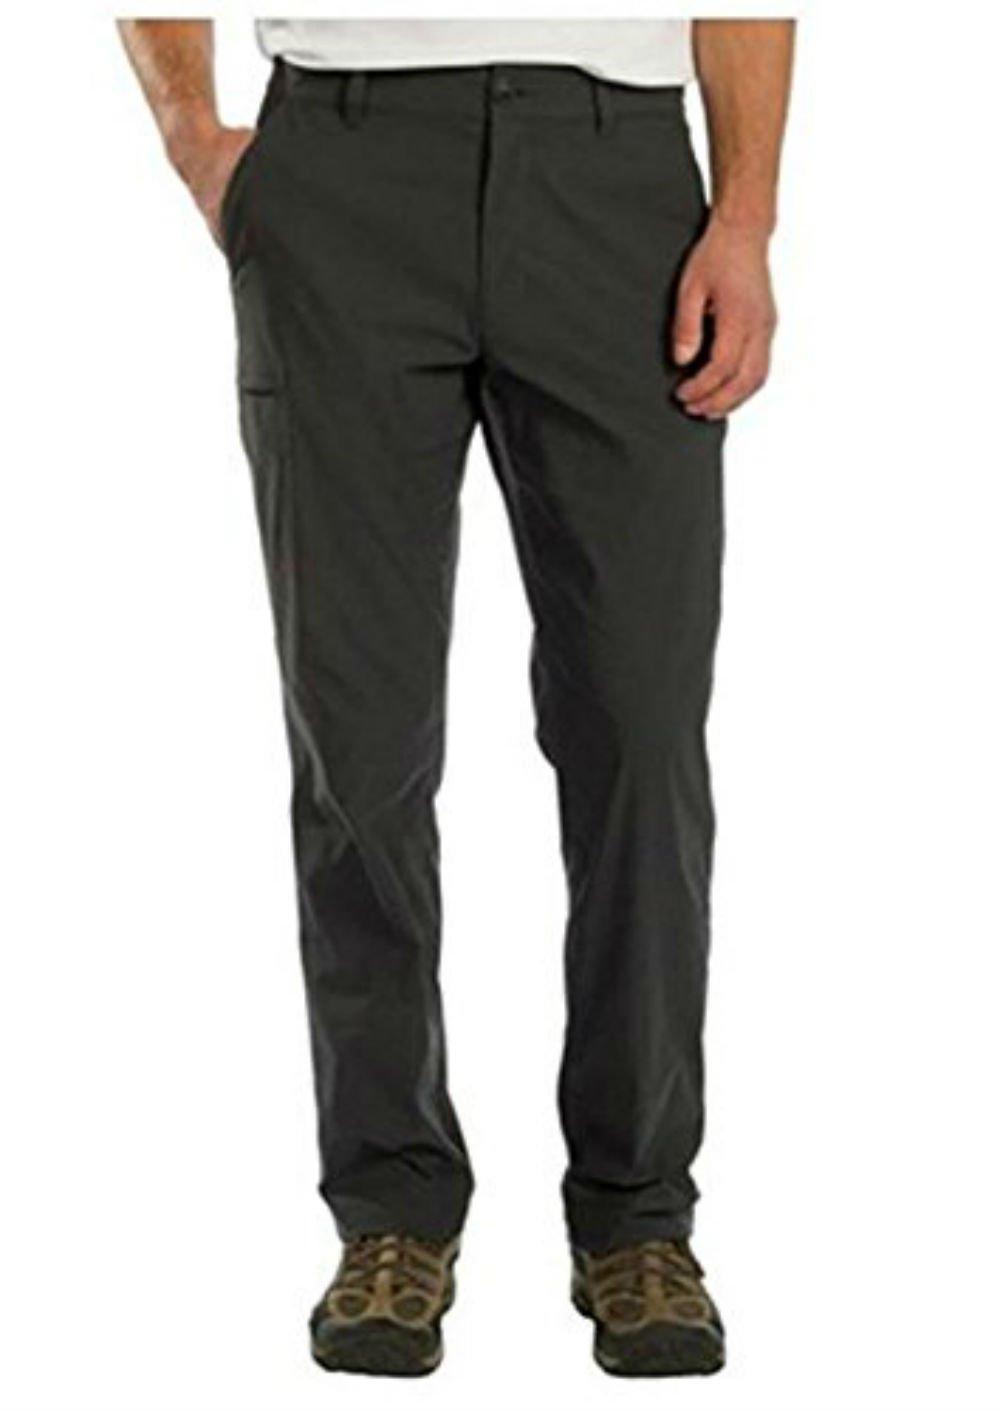 UB Tech Men's Rainier Travel Chino Active Cargo Pants UPF 50 Charcoal 34W 36L